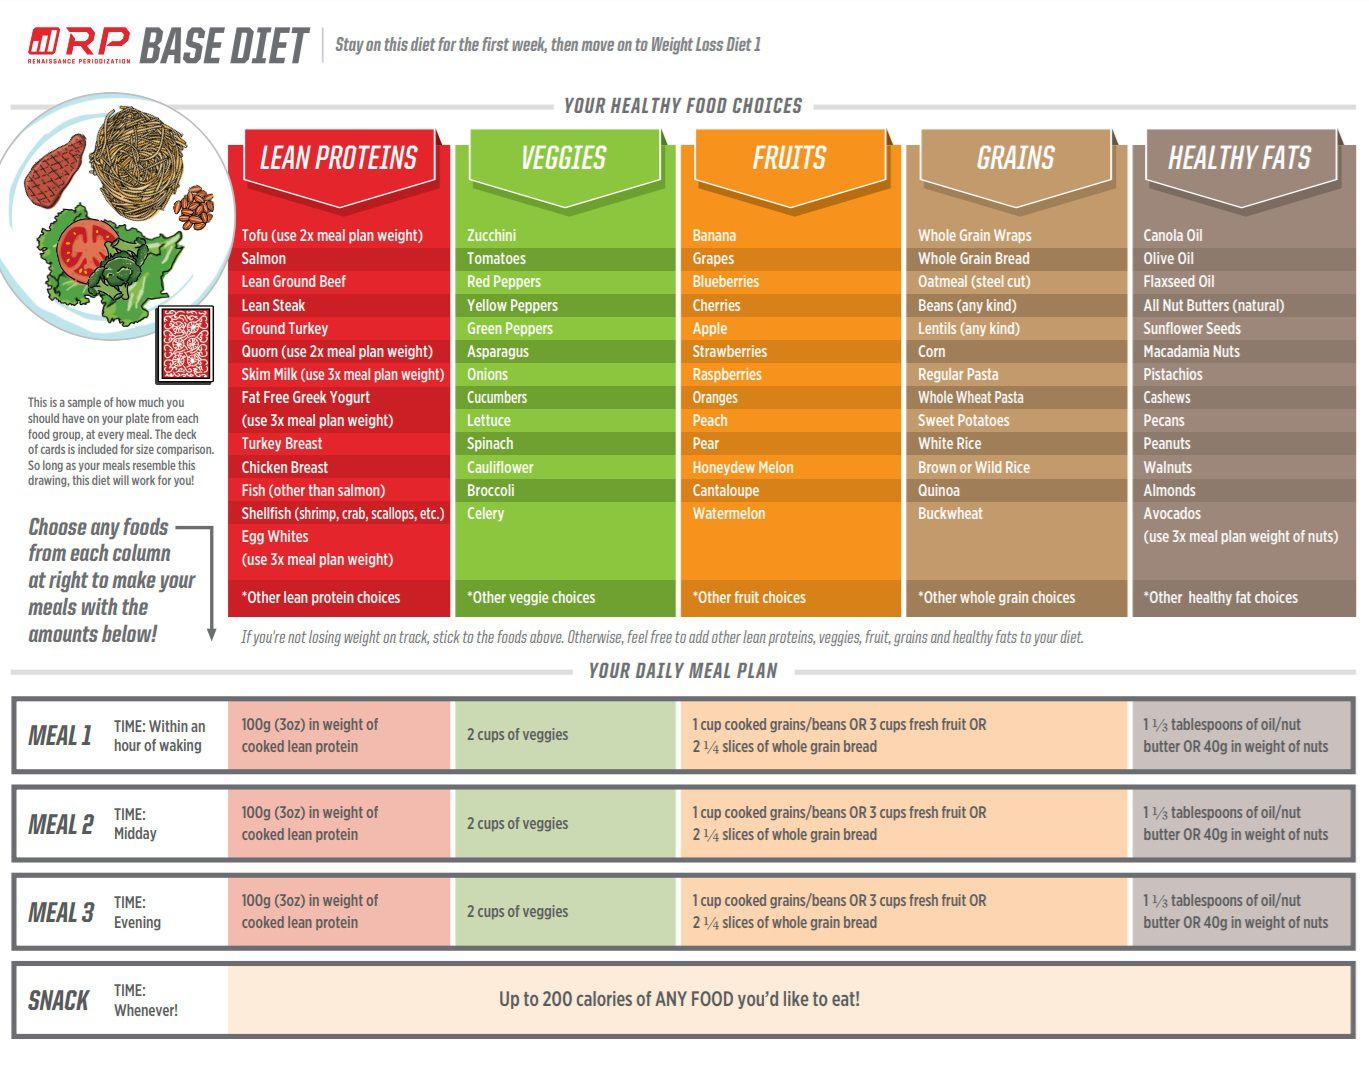 007 Unforgettable Eating Plan Template Pdf Idea  Food Safety Sample Keto Meal Gestational DiabeteFull